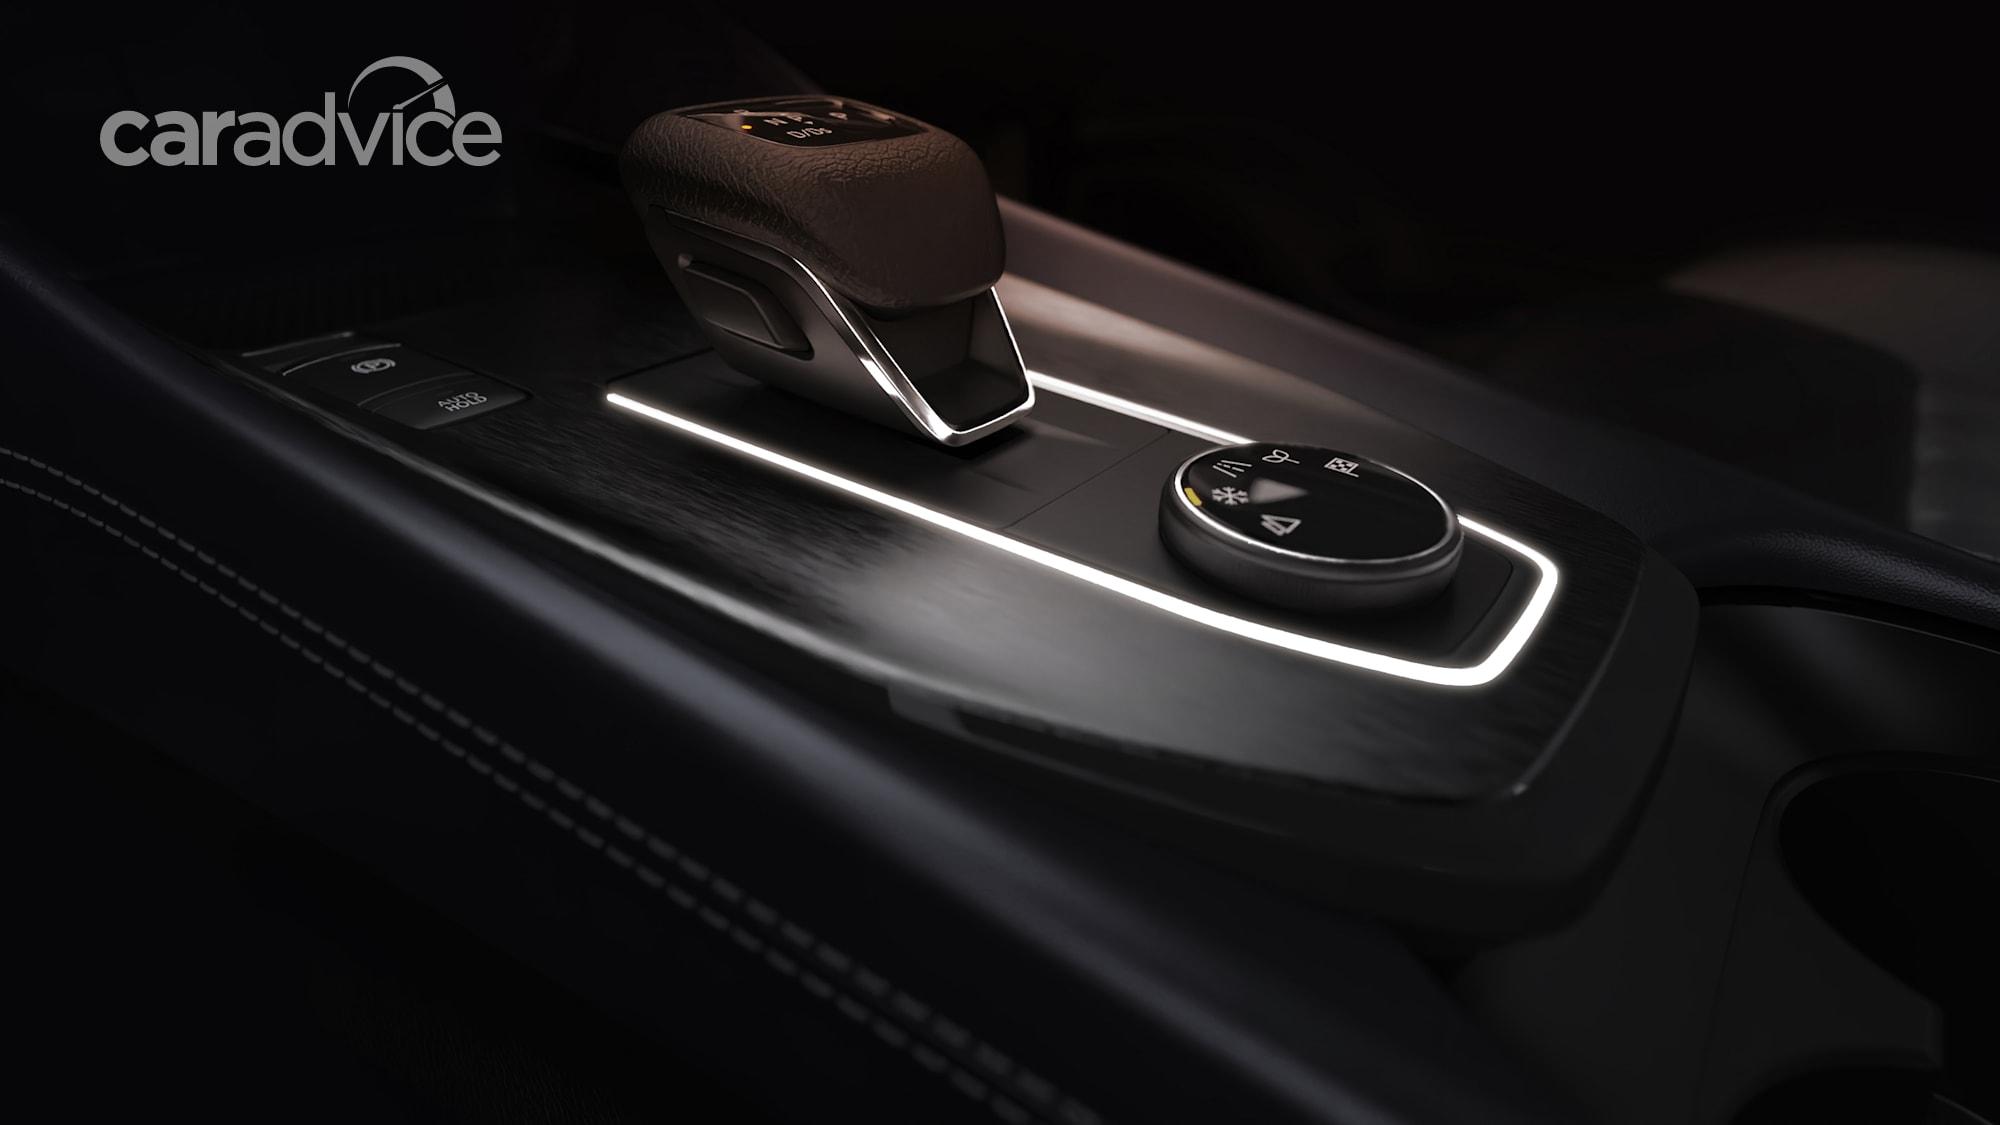 2021 Nissan Qashqai interior teased: Small SUV to score ...